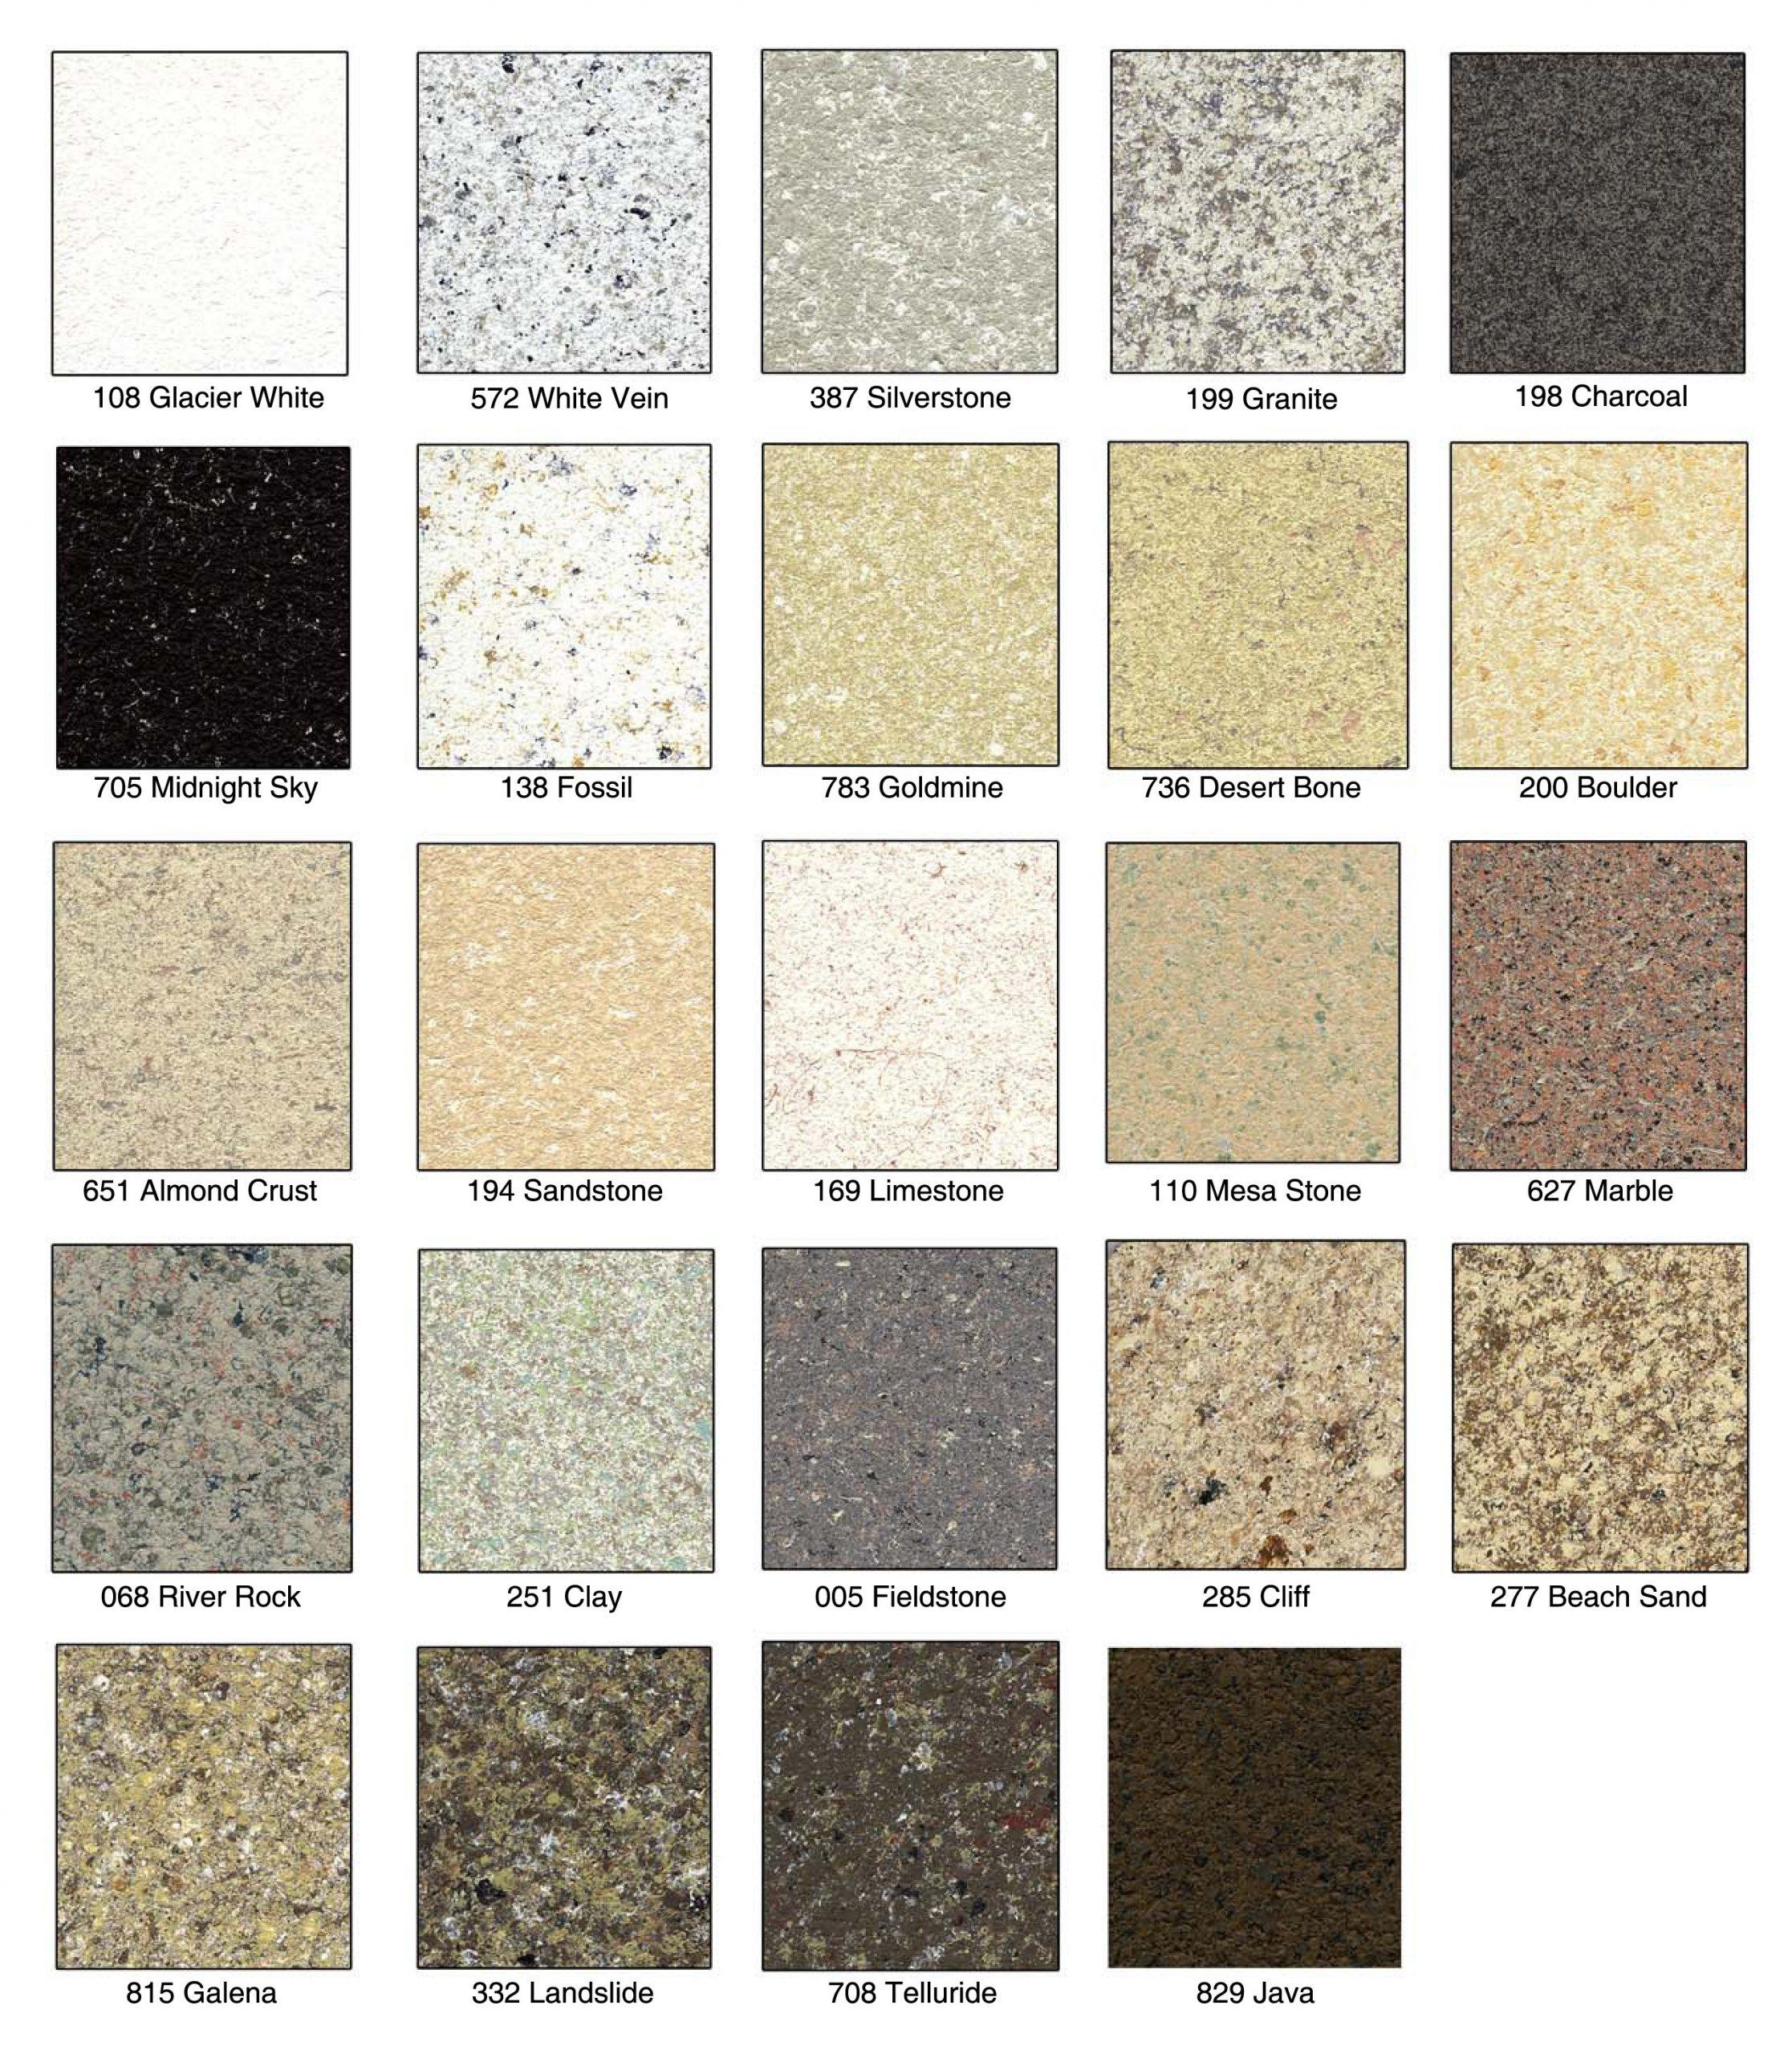 countertop resurfacing colors  Colors that looks like stone - Countertops resurfacing in ..